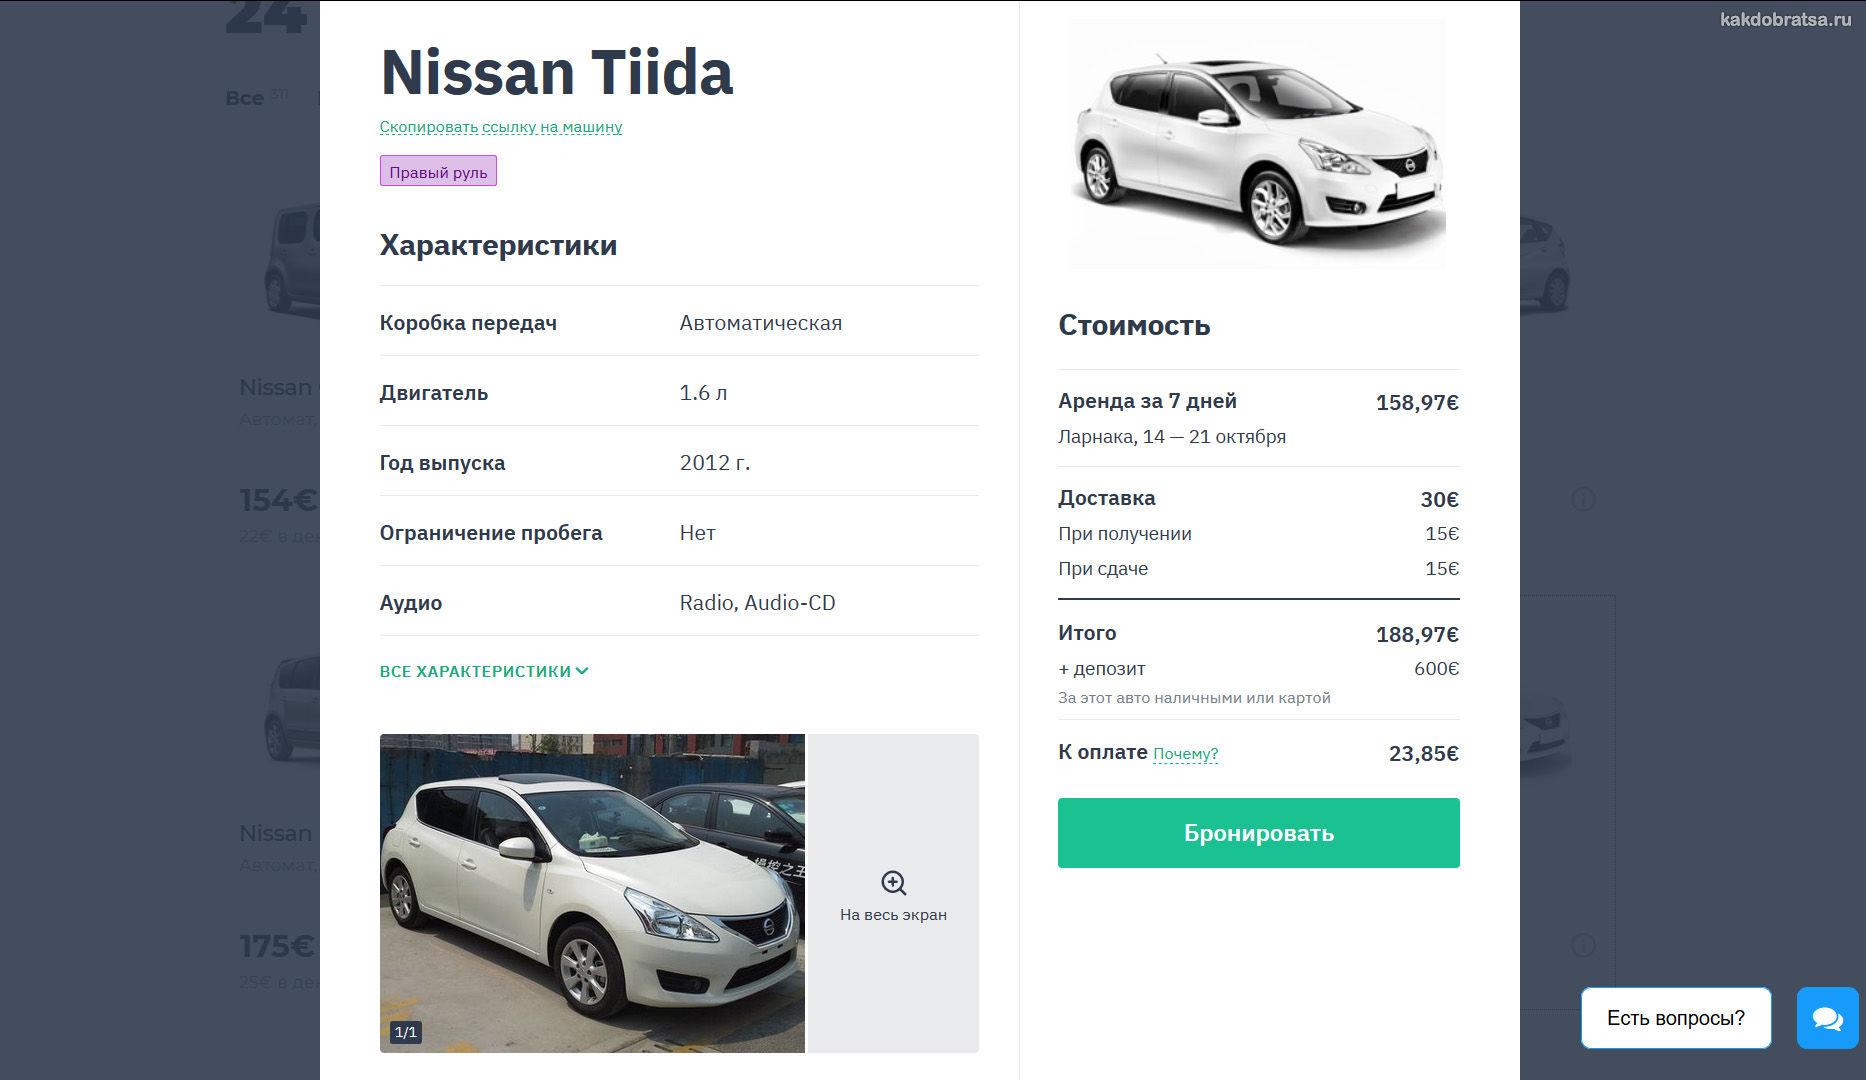 Аренда авто в Ларнаке дешево без залога